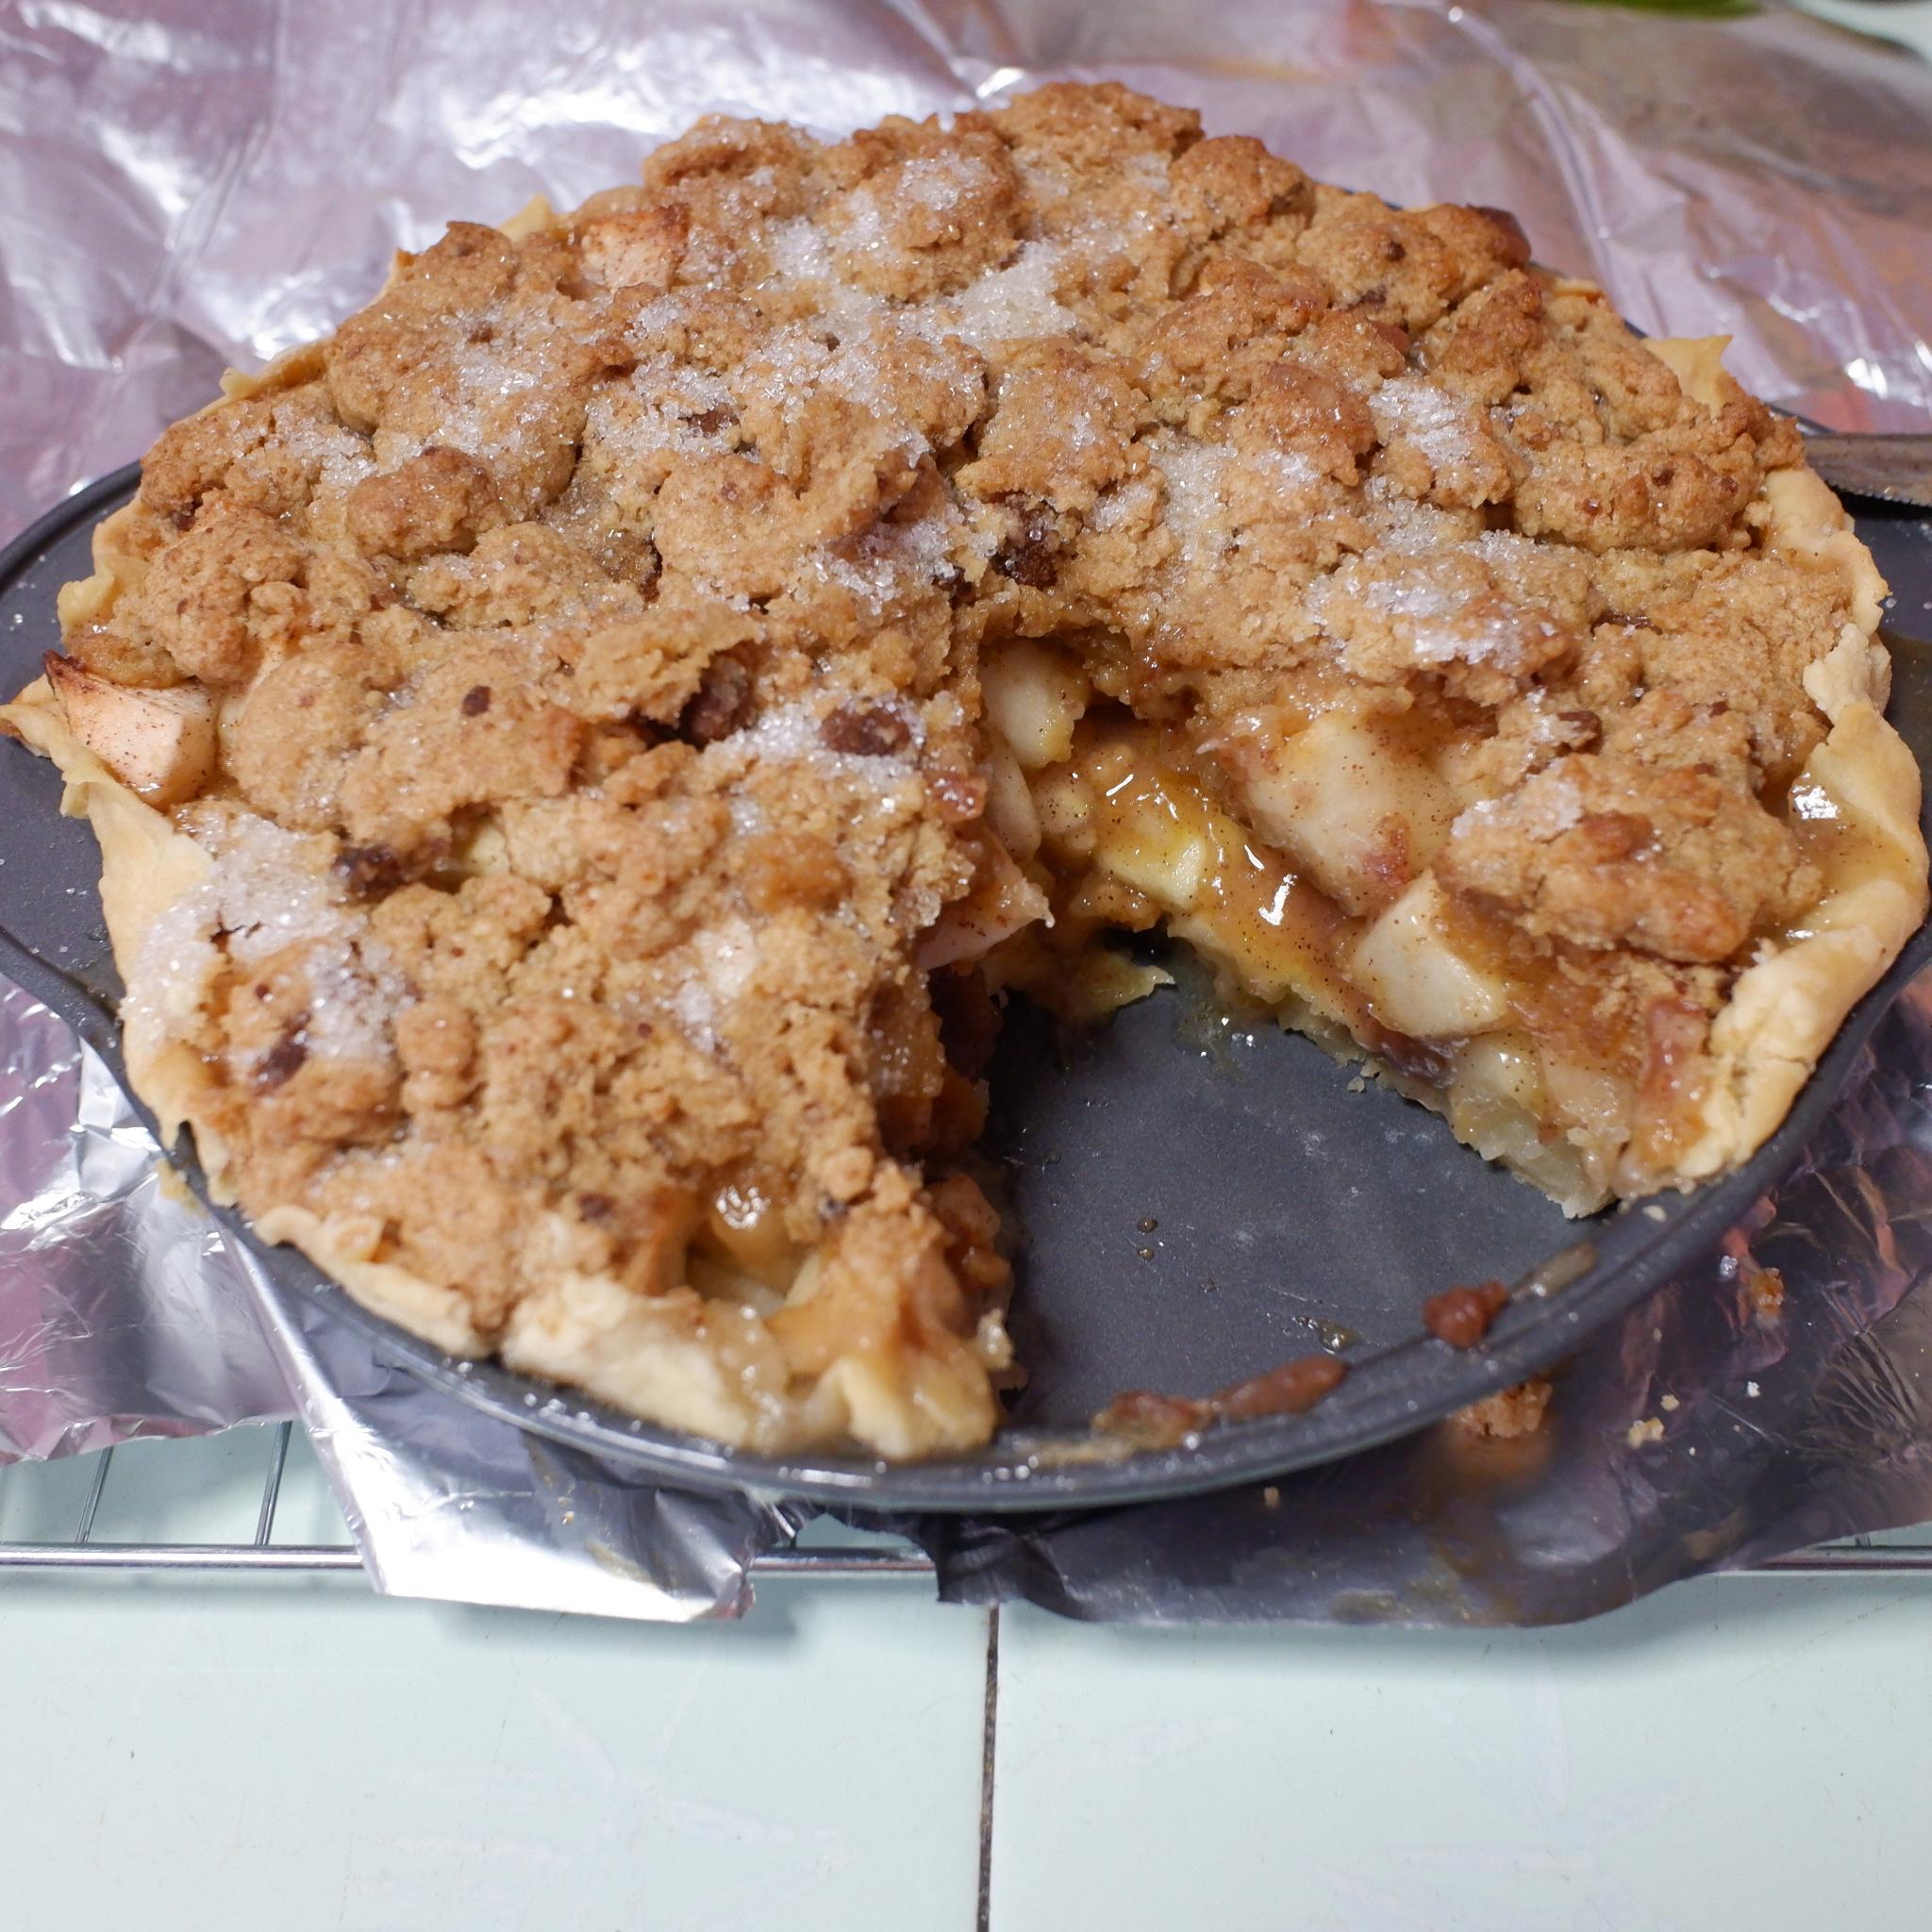 Pudding-dscf0872-jpg